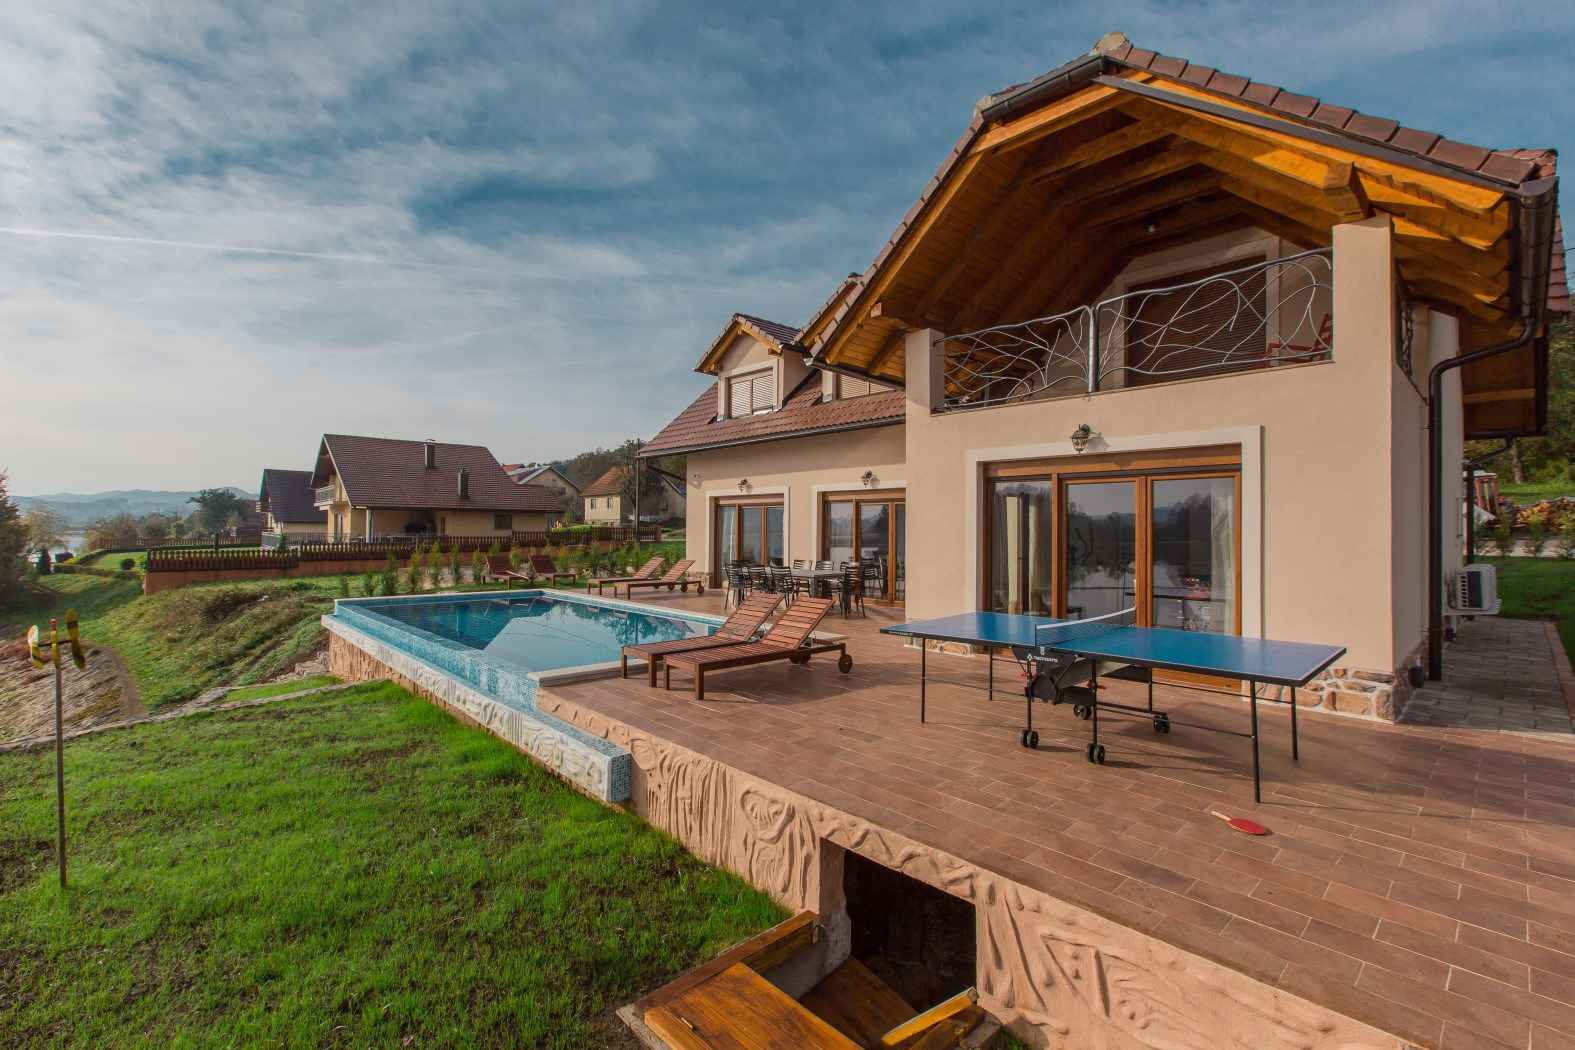 Ferienhaus mit Pool am See gelegen (2047240), Ogulin, , Mittelkroatien, Kroatien, Bild 6